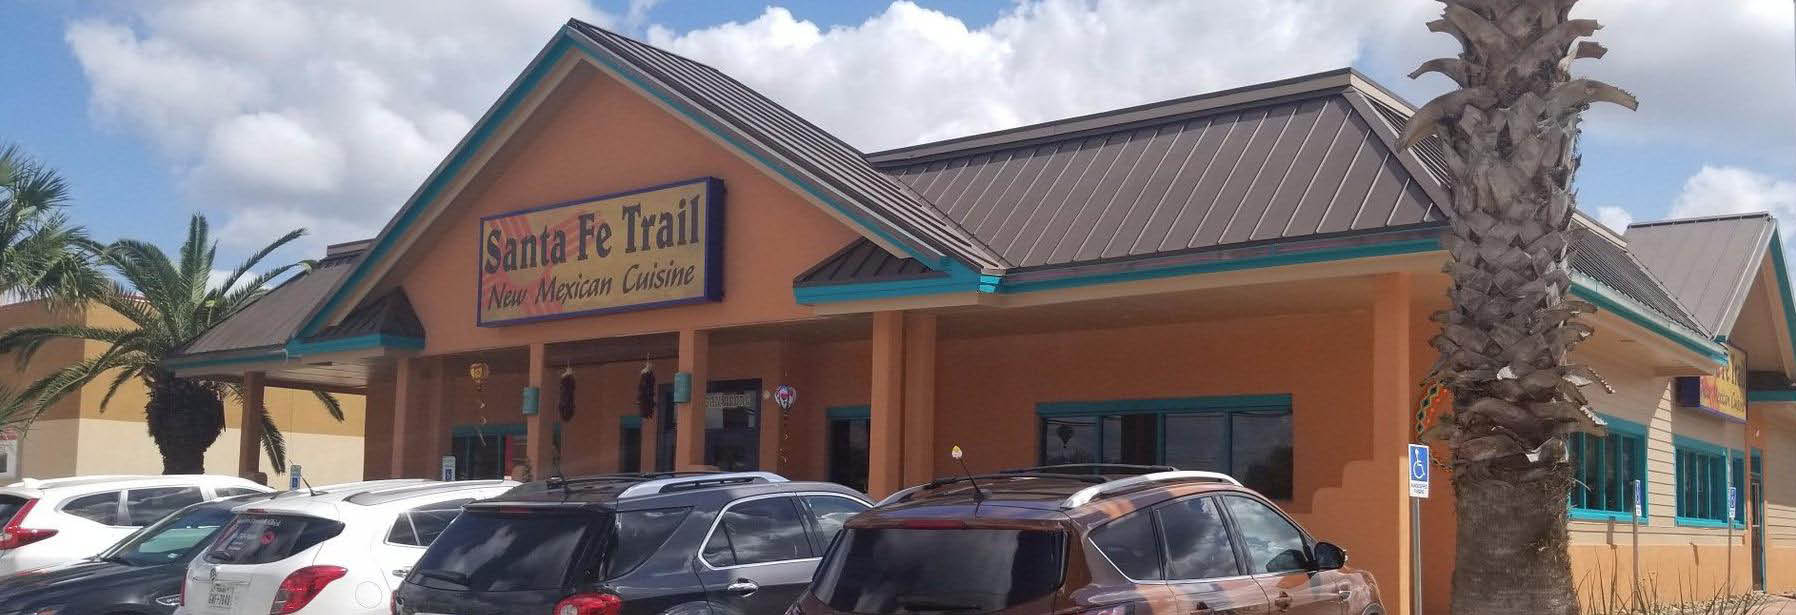 Santa Fe Trail New Mexican Cuisine Banner Image